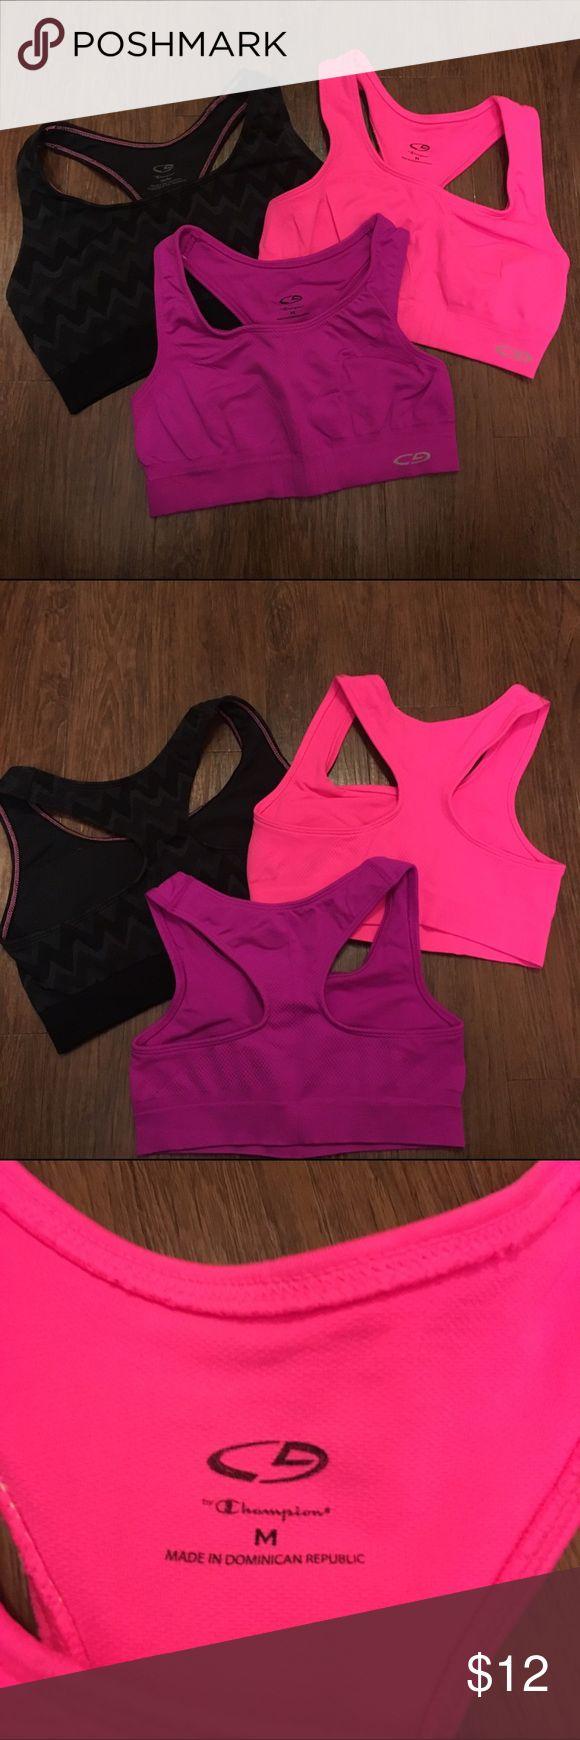 C9 Champion Sports Bras Size M Preowned C9 Champion sports bra bundle from target. All are Size M. Champion Intimates & Sleepwear Bras